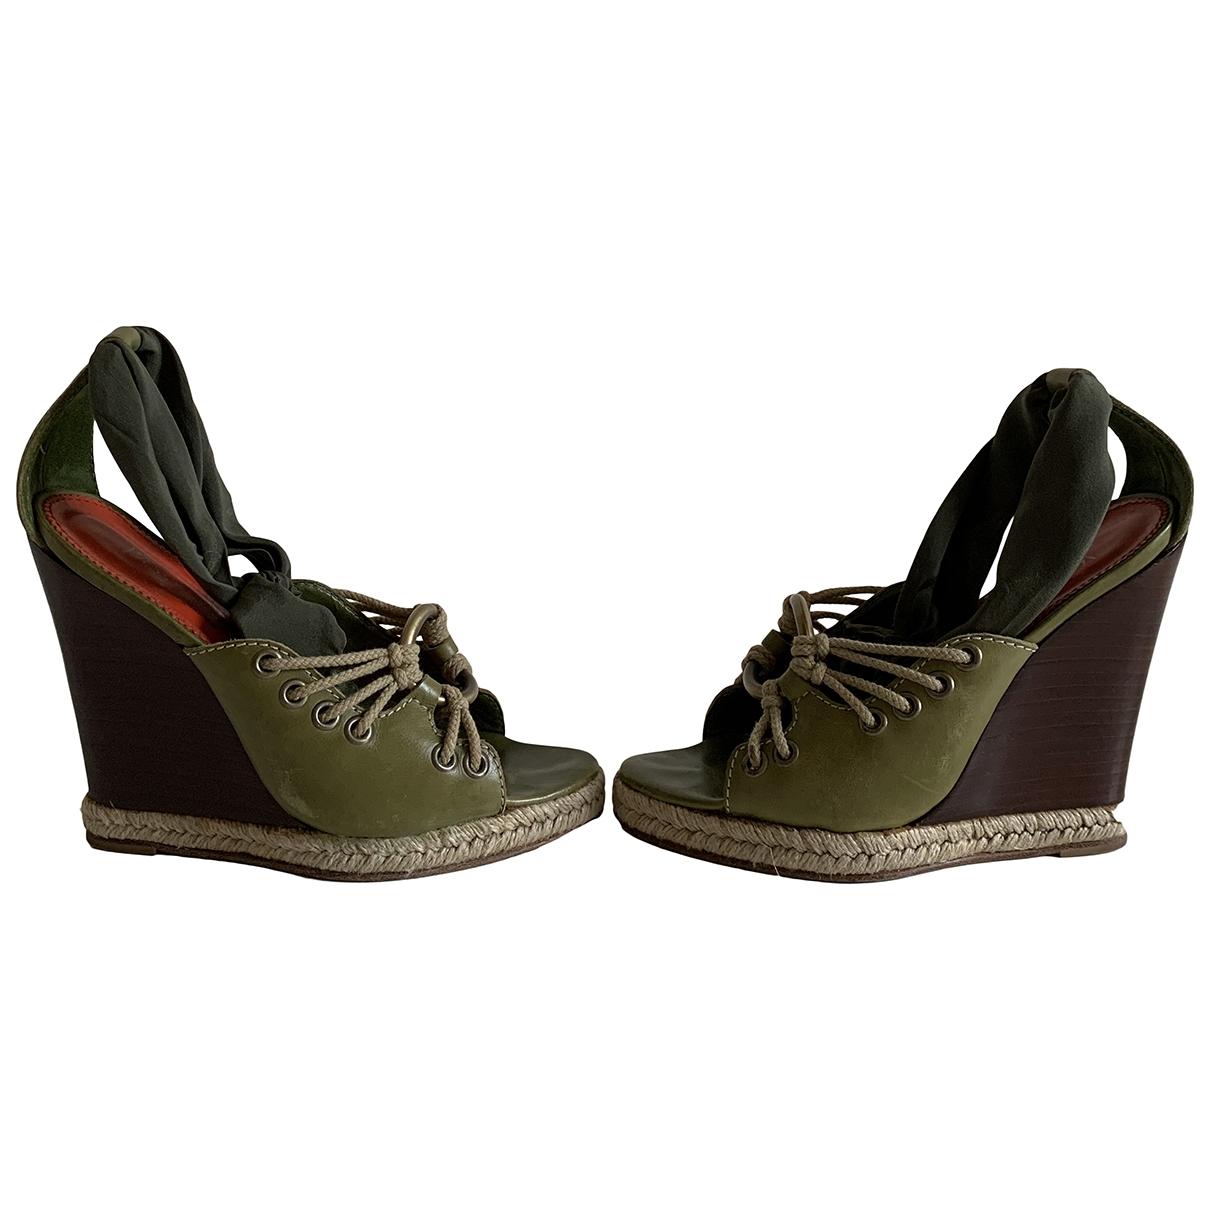 Yves Saint Laurent \N Green Leather Sandals for Women 36 EU